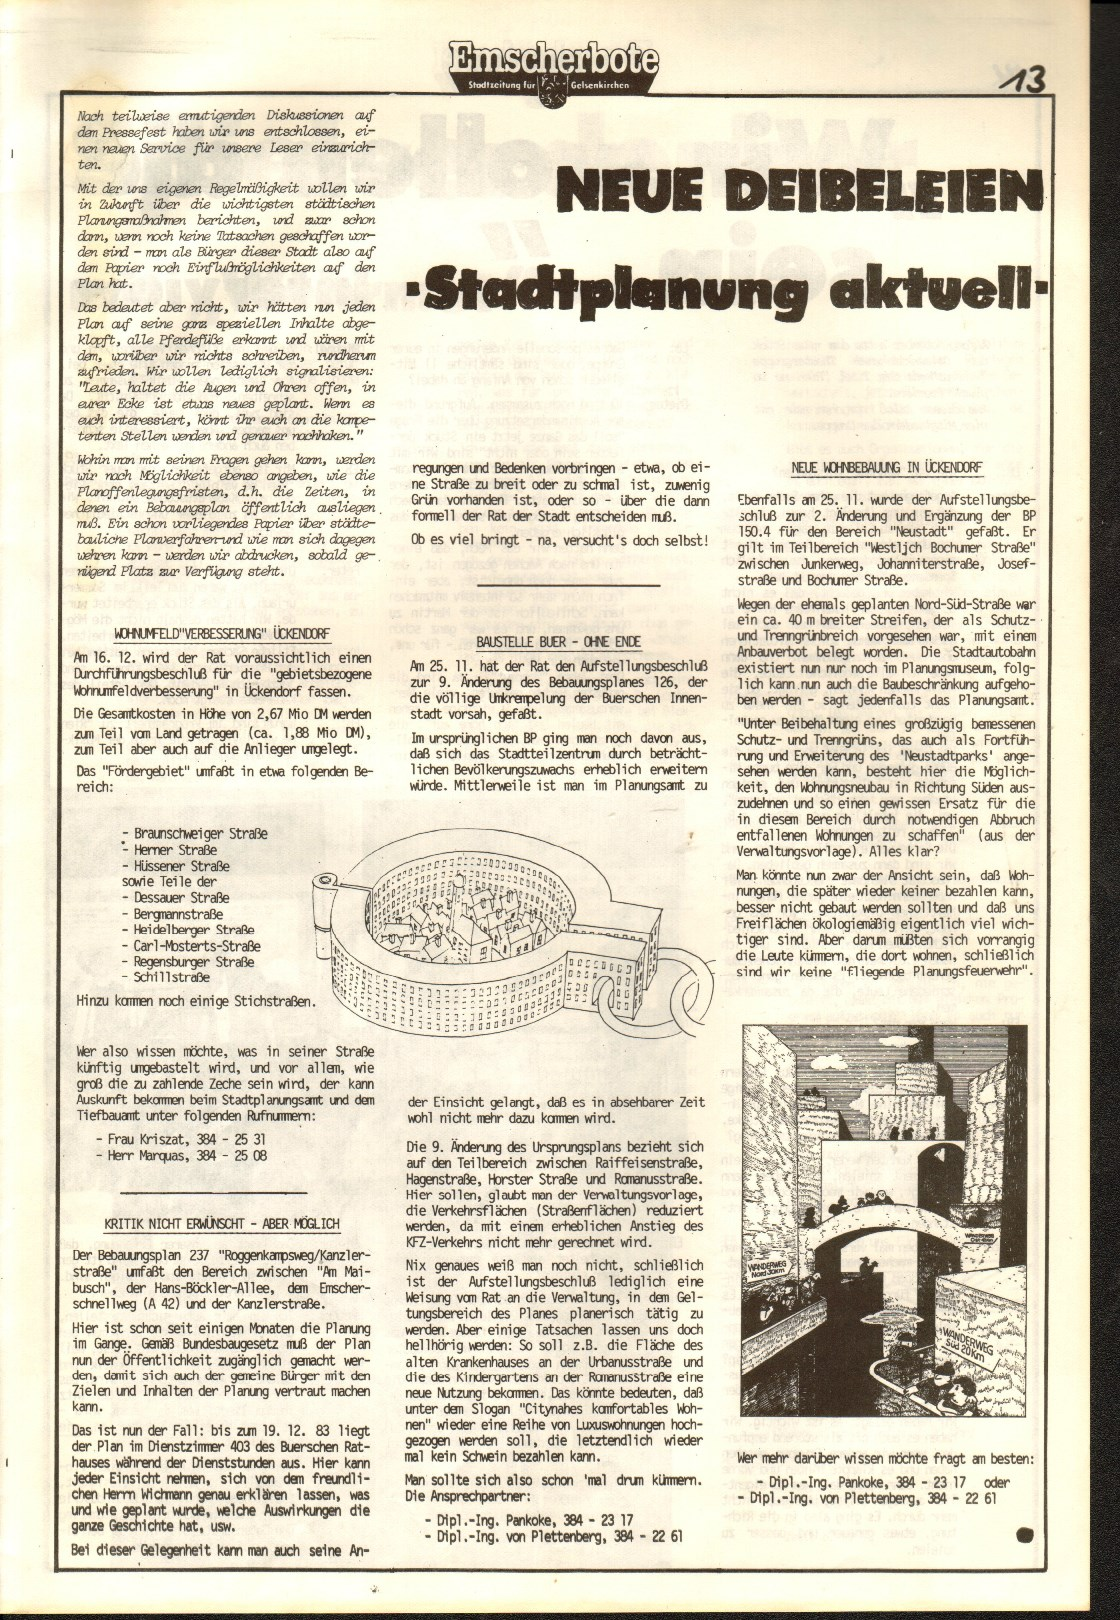 Gelsenkirchen_Emscherbote_1983_34_13